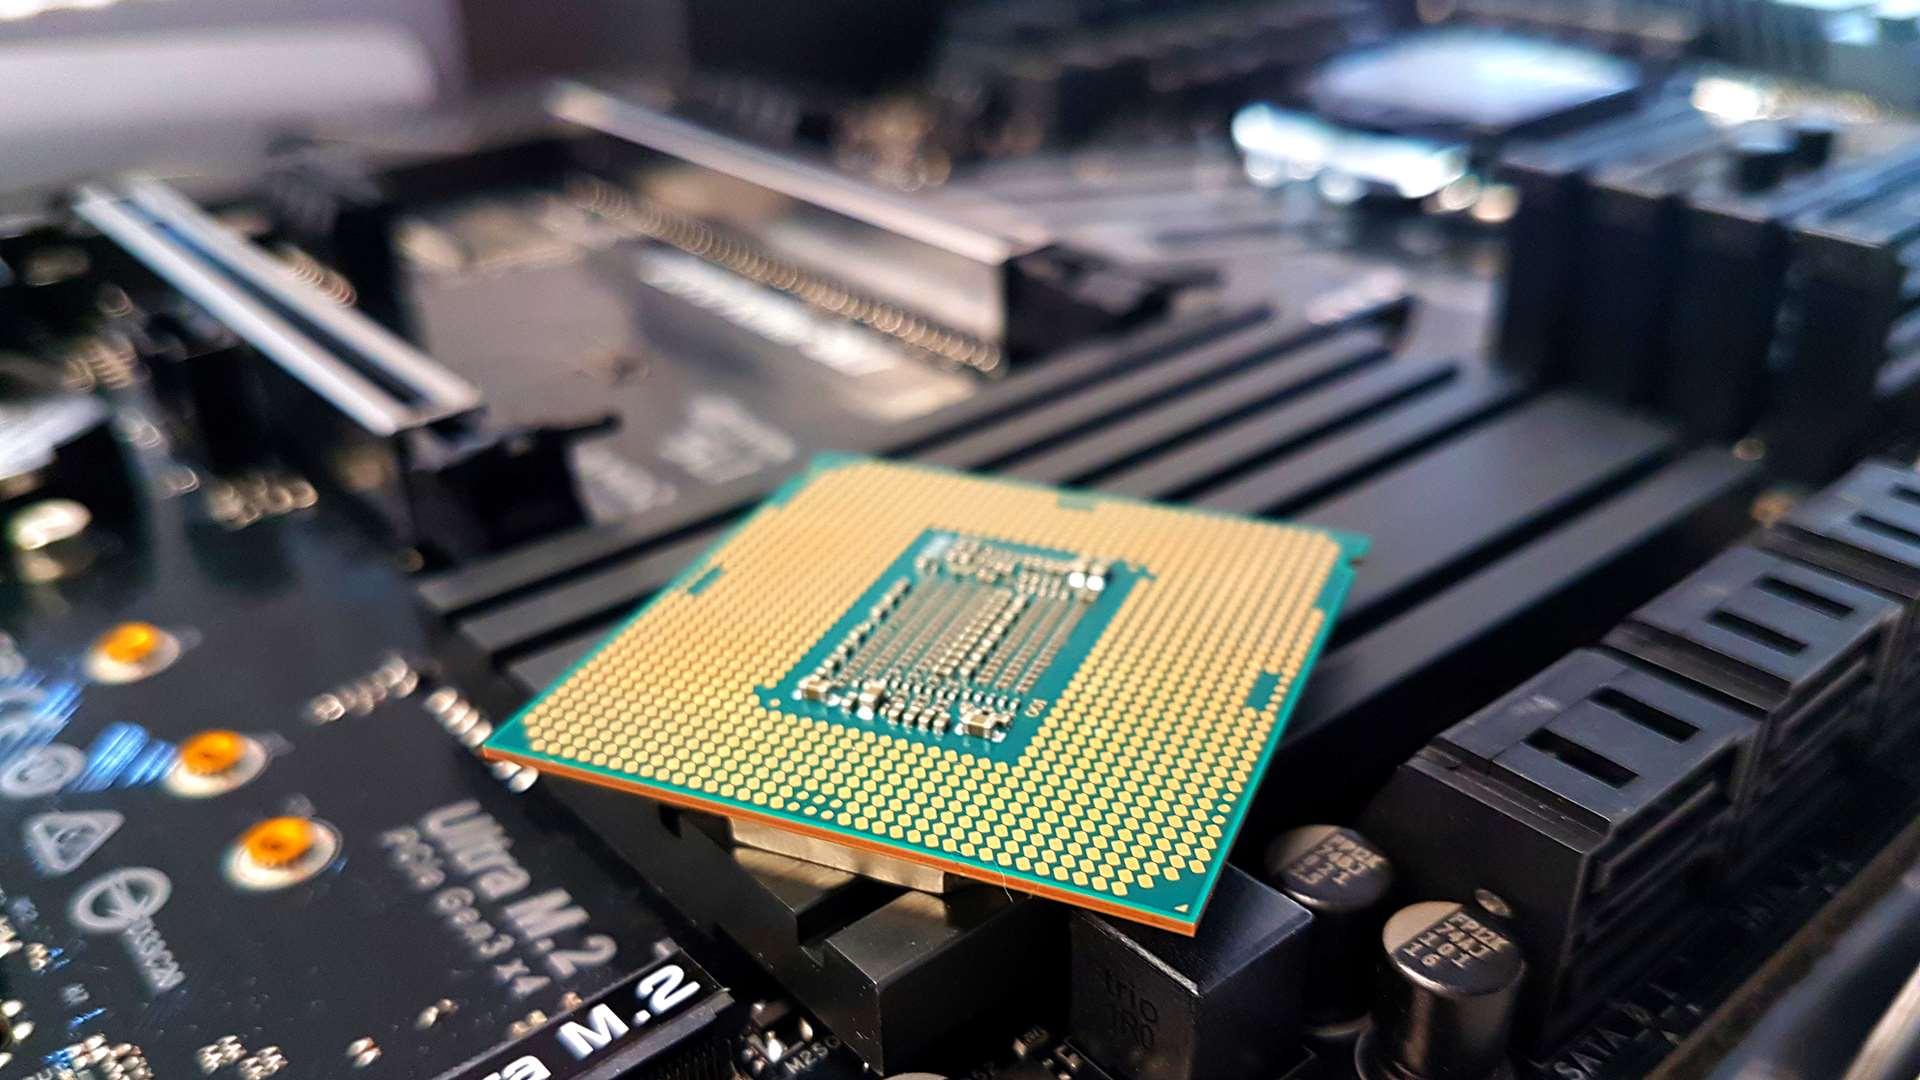 Intel i9 11900K overclock pushes 11th gen Rocket Lake past 7GHz